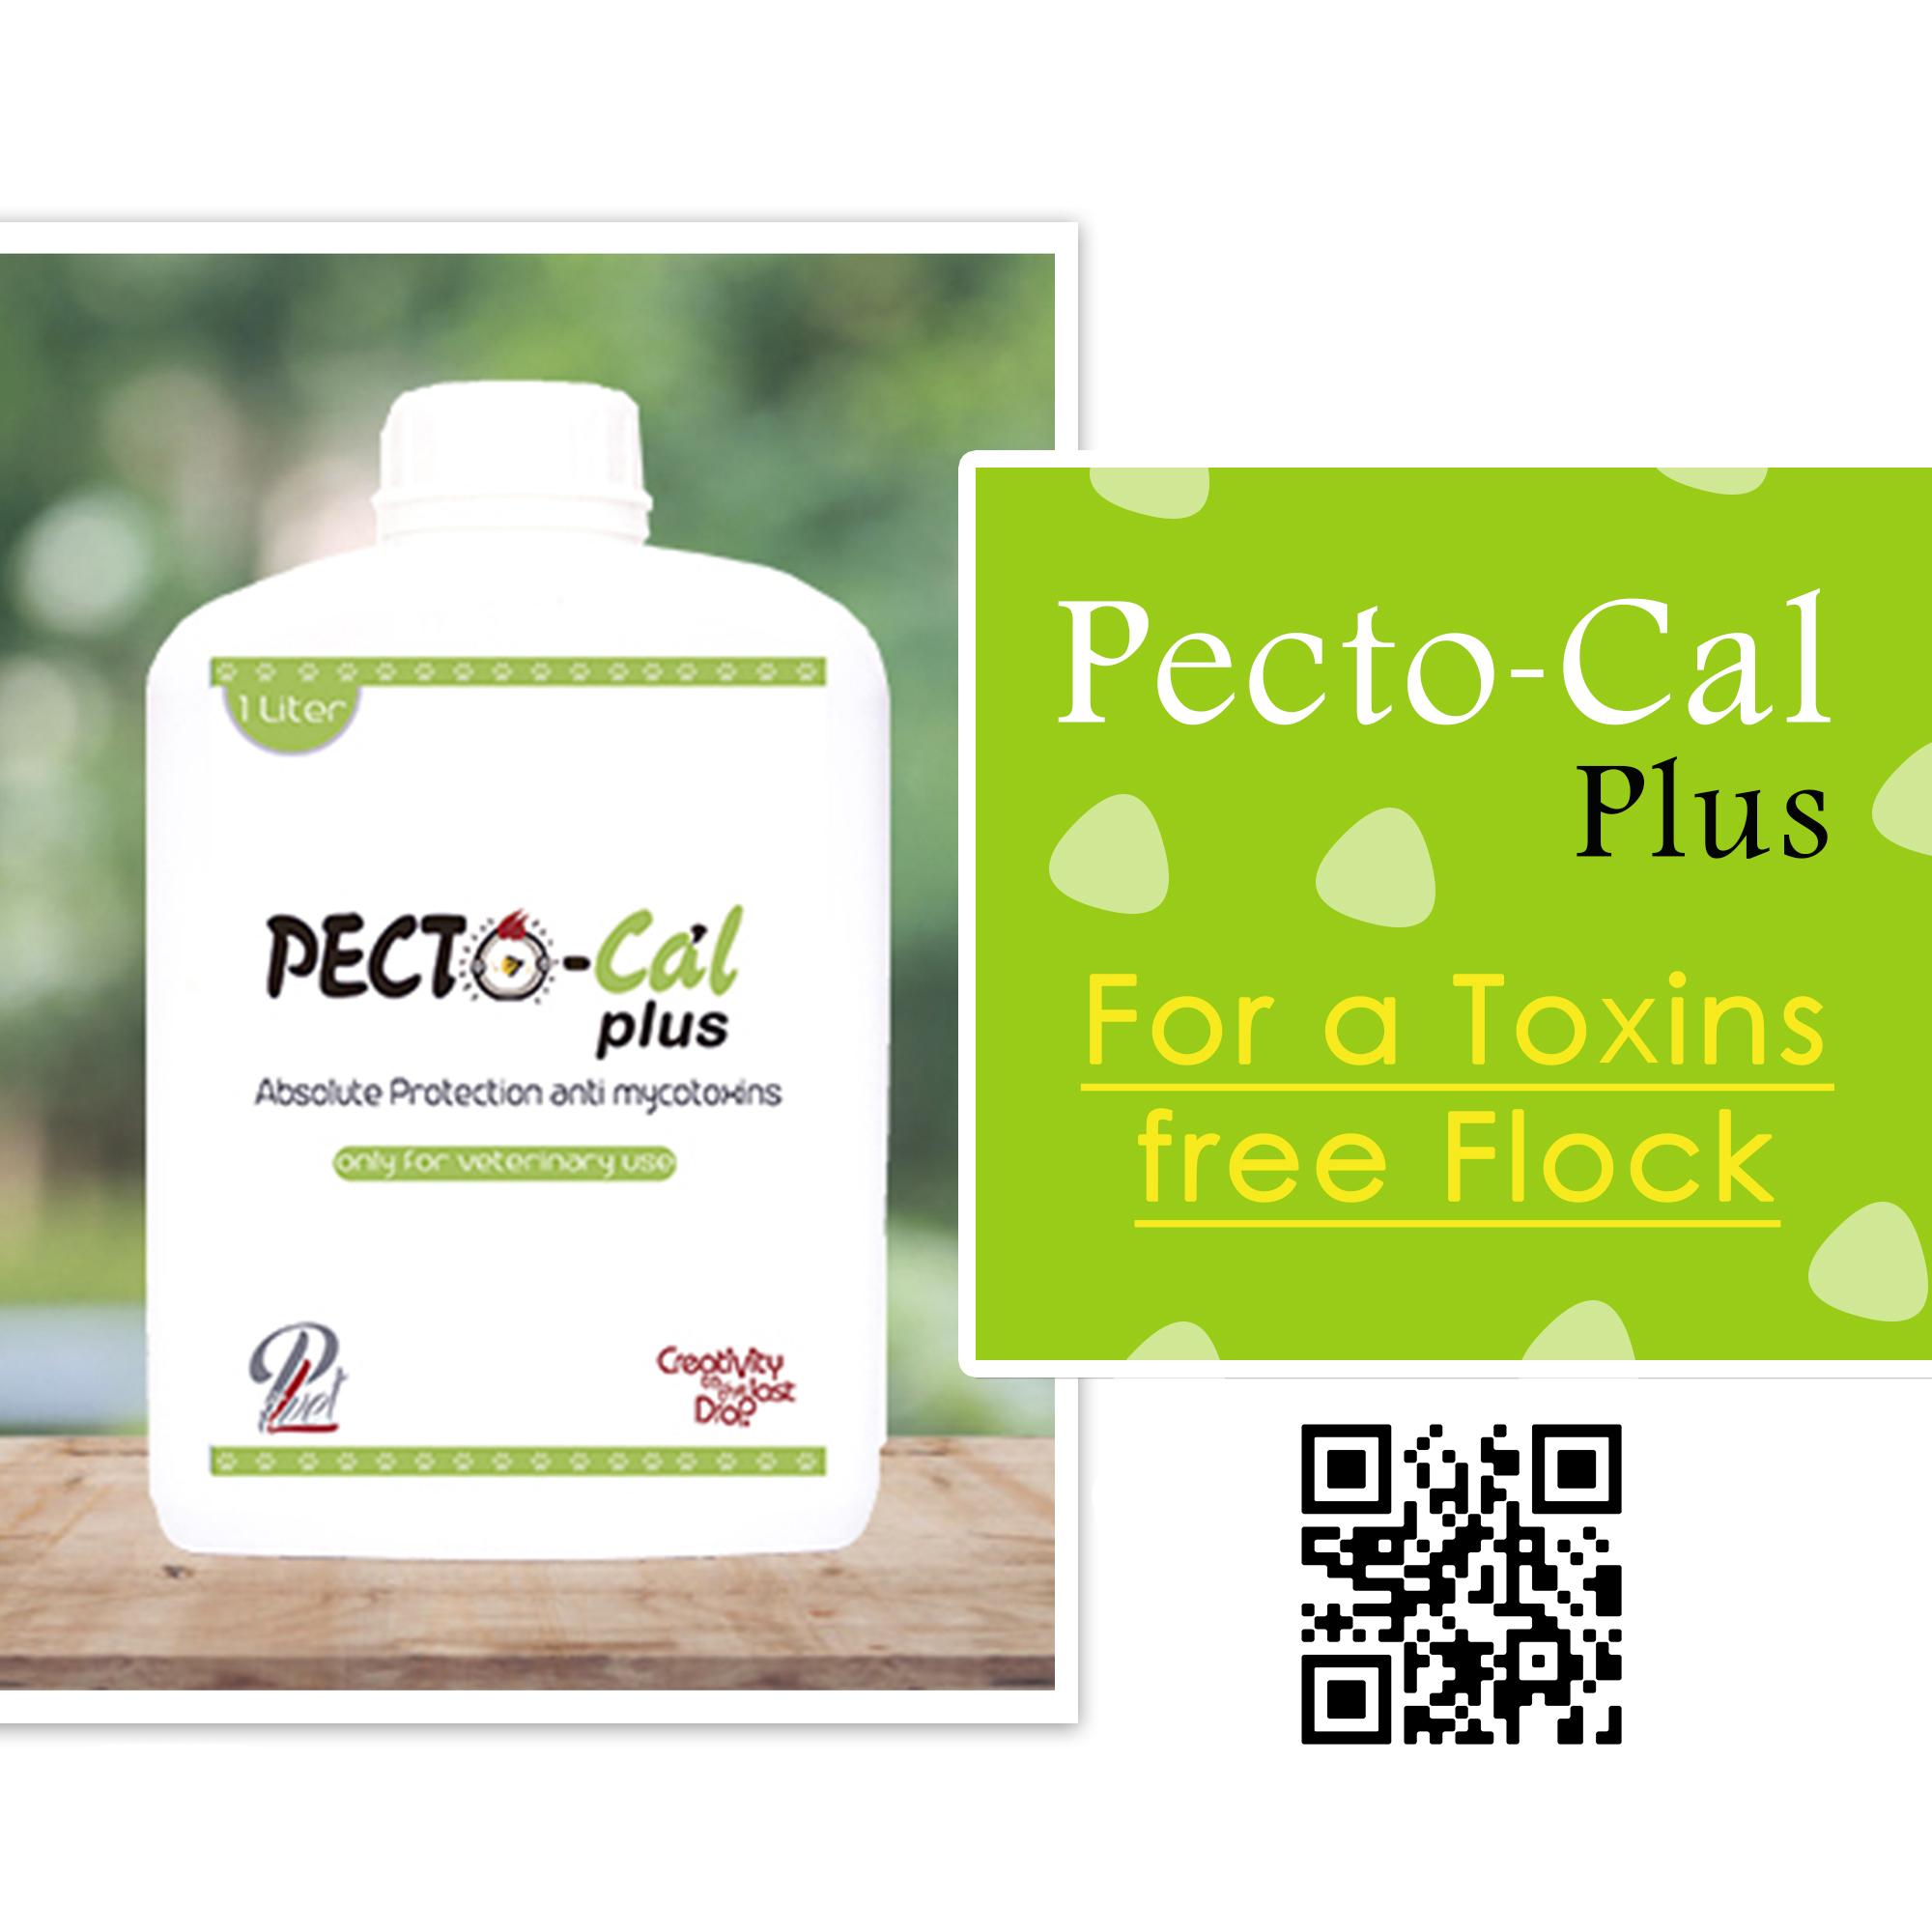 Pectocal plus